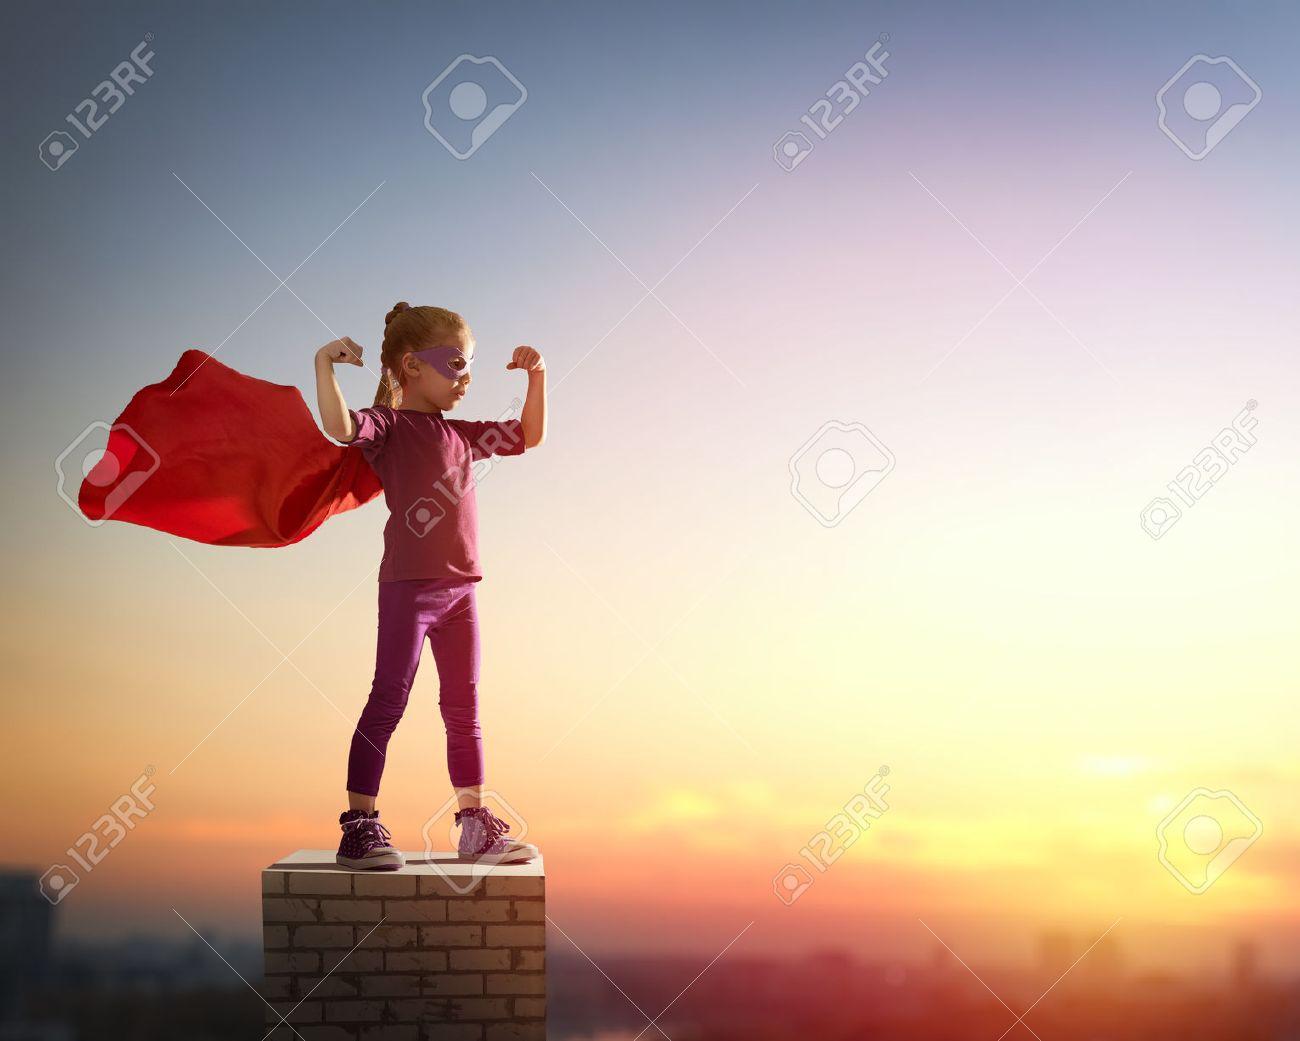 Little child girl plays superhero. Child on the background of sunset sky. Girl power concept - 53752799